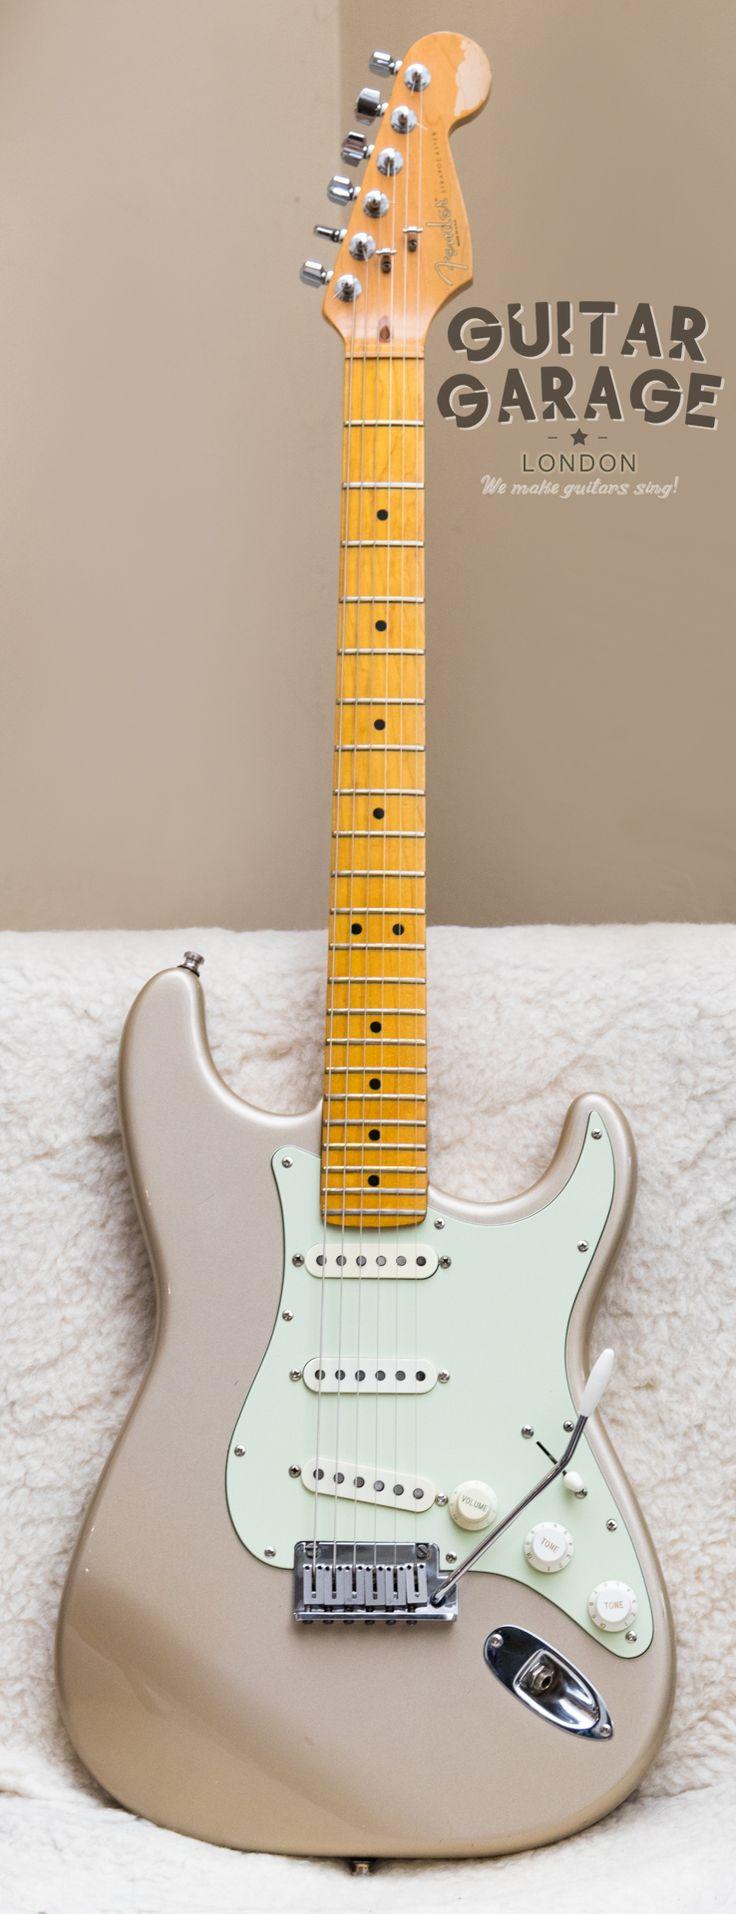 1997 Fender American Standard Stratocaster Shoreline Gold